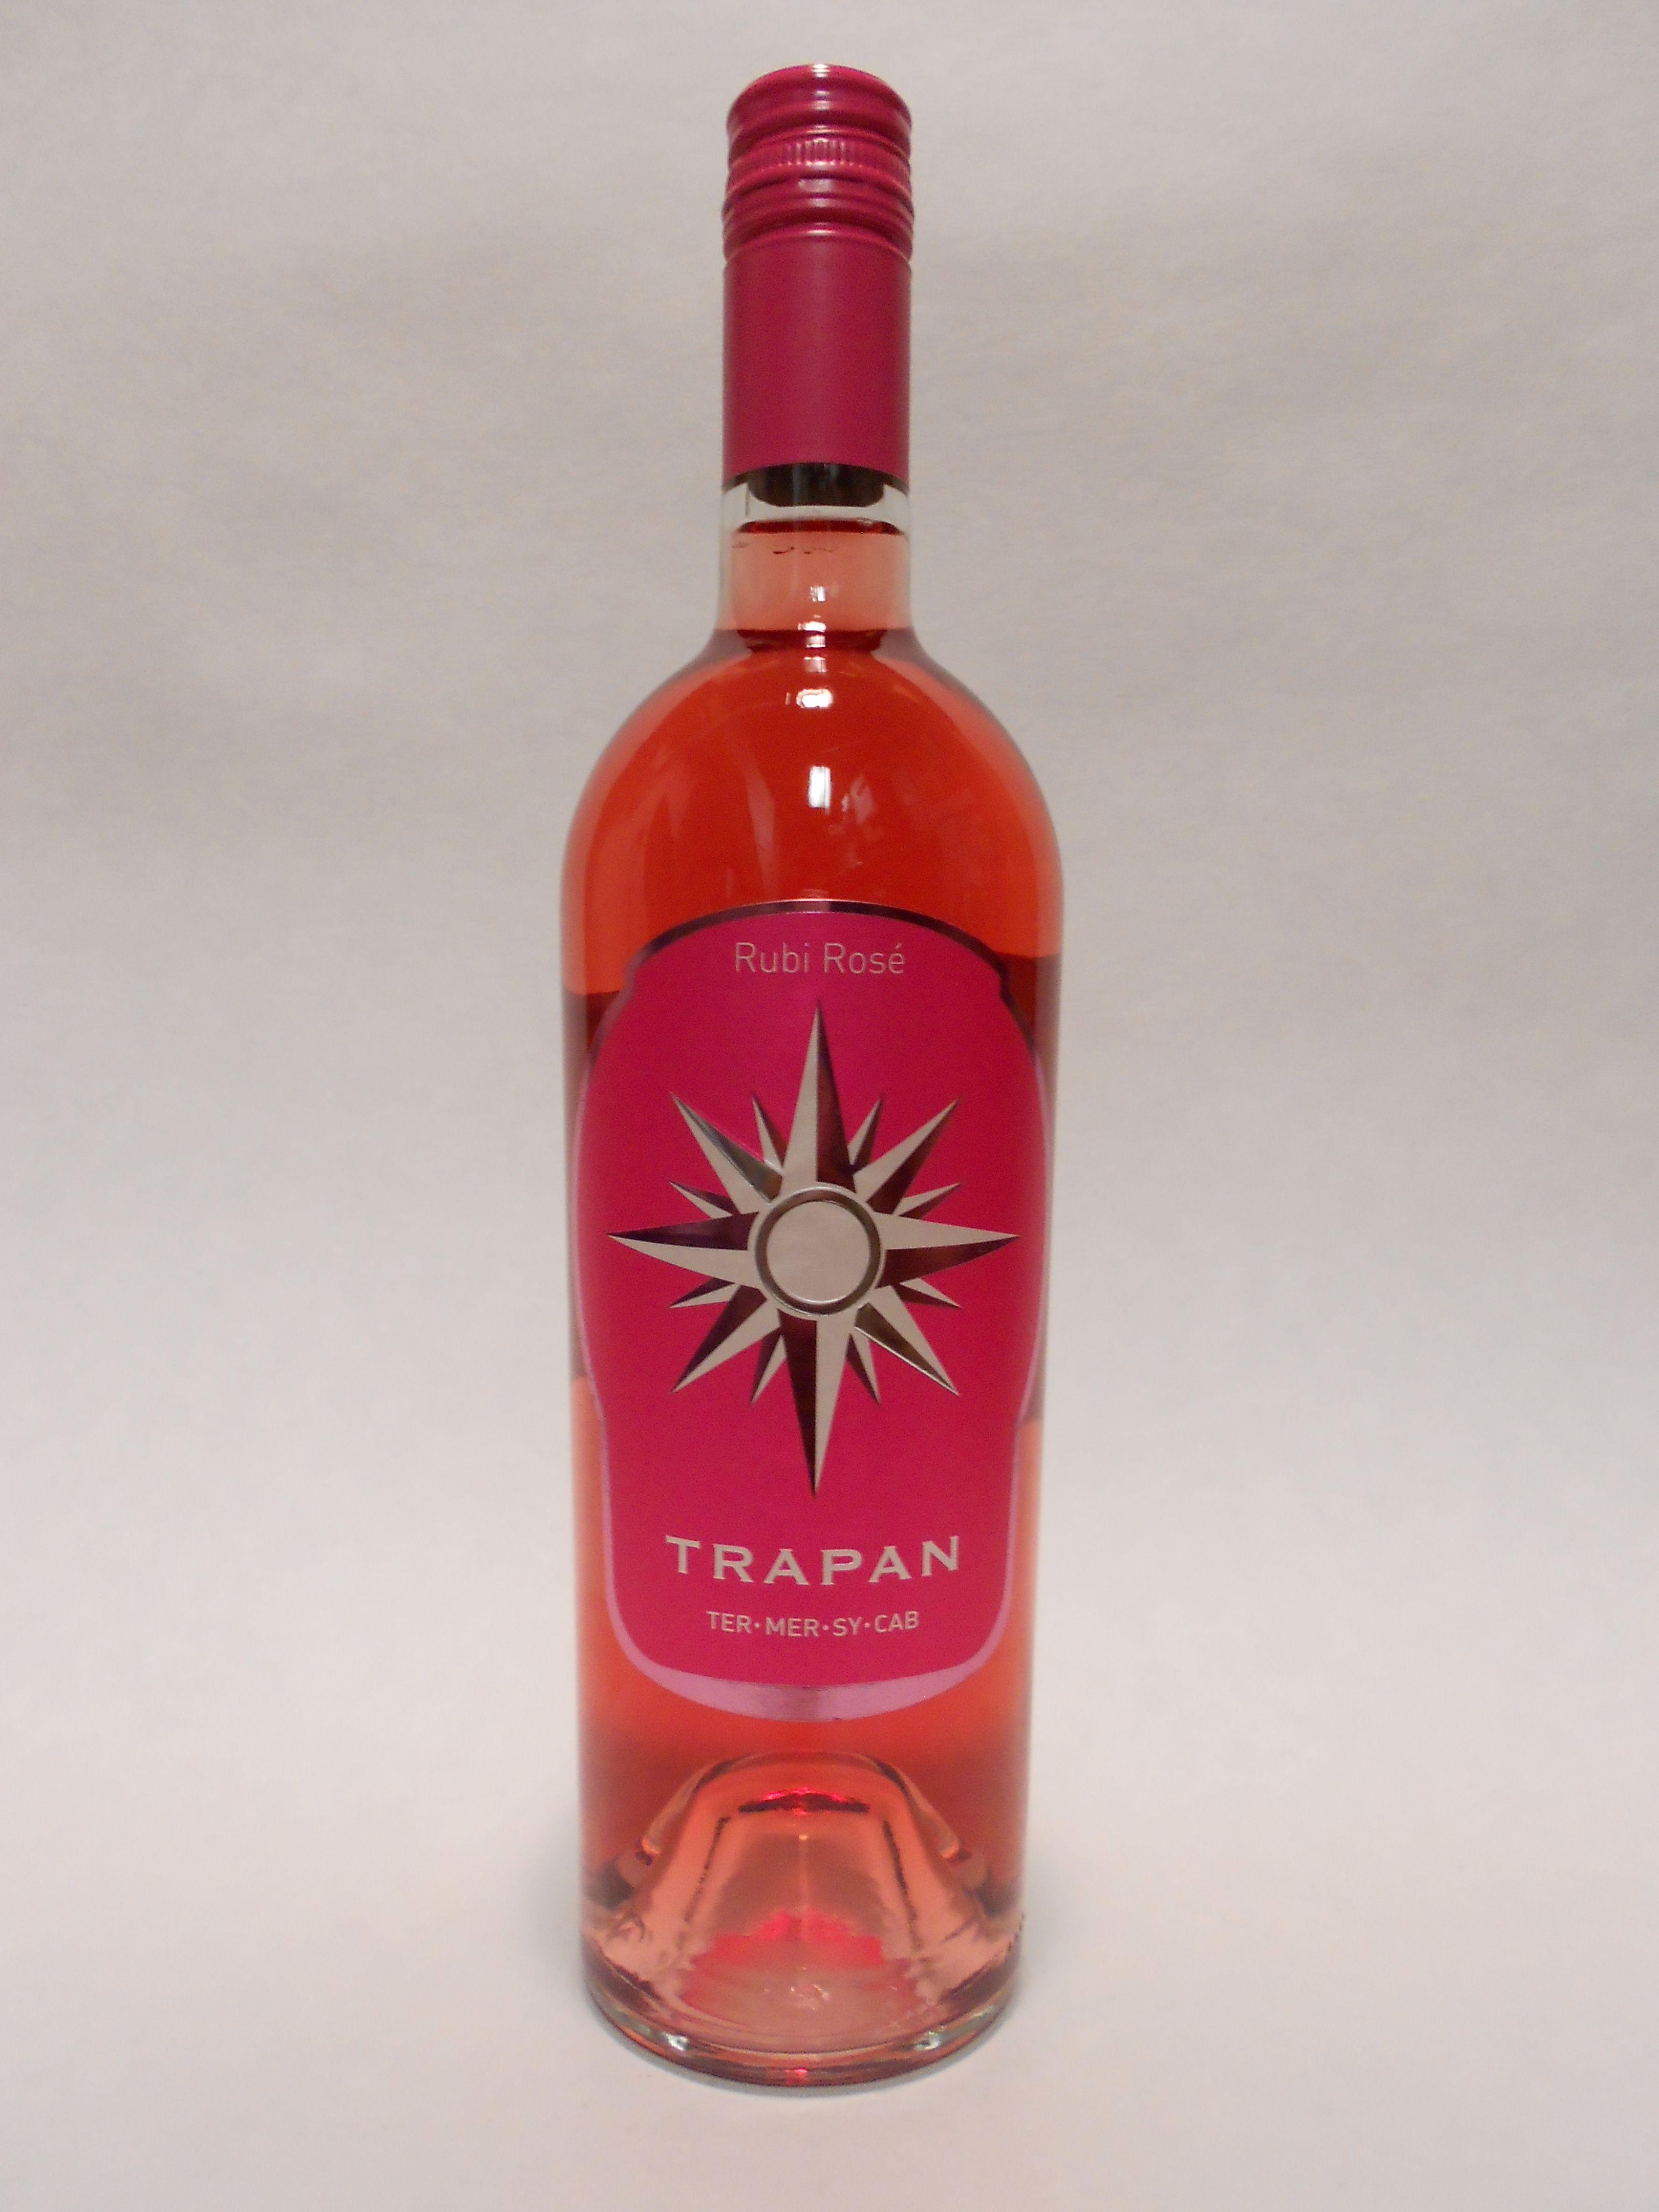 2013 Trapan Rubi Rose Sku 62099 Www Bassins Com Phone 202 338 1433 Vino Rosado Vinos